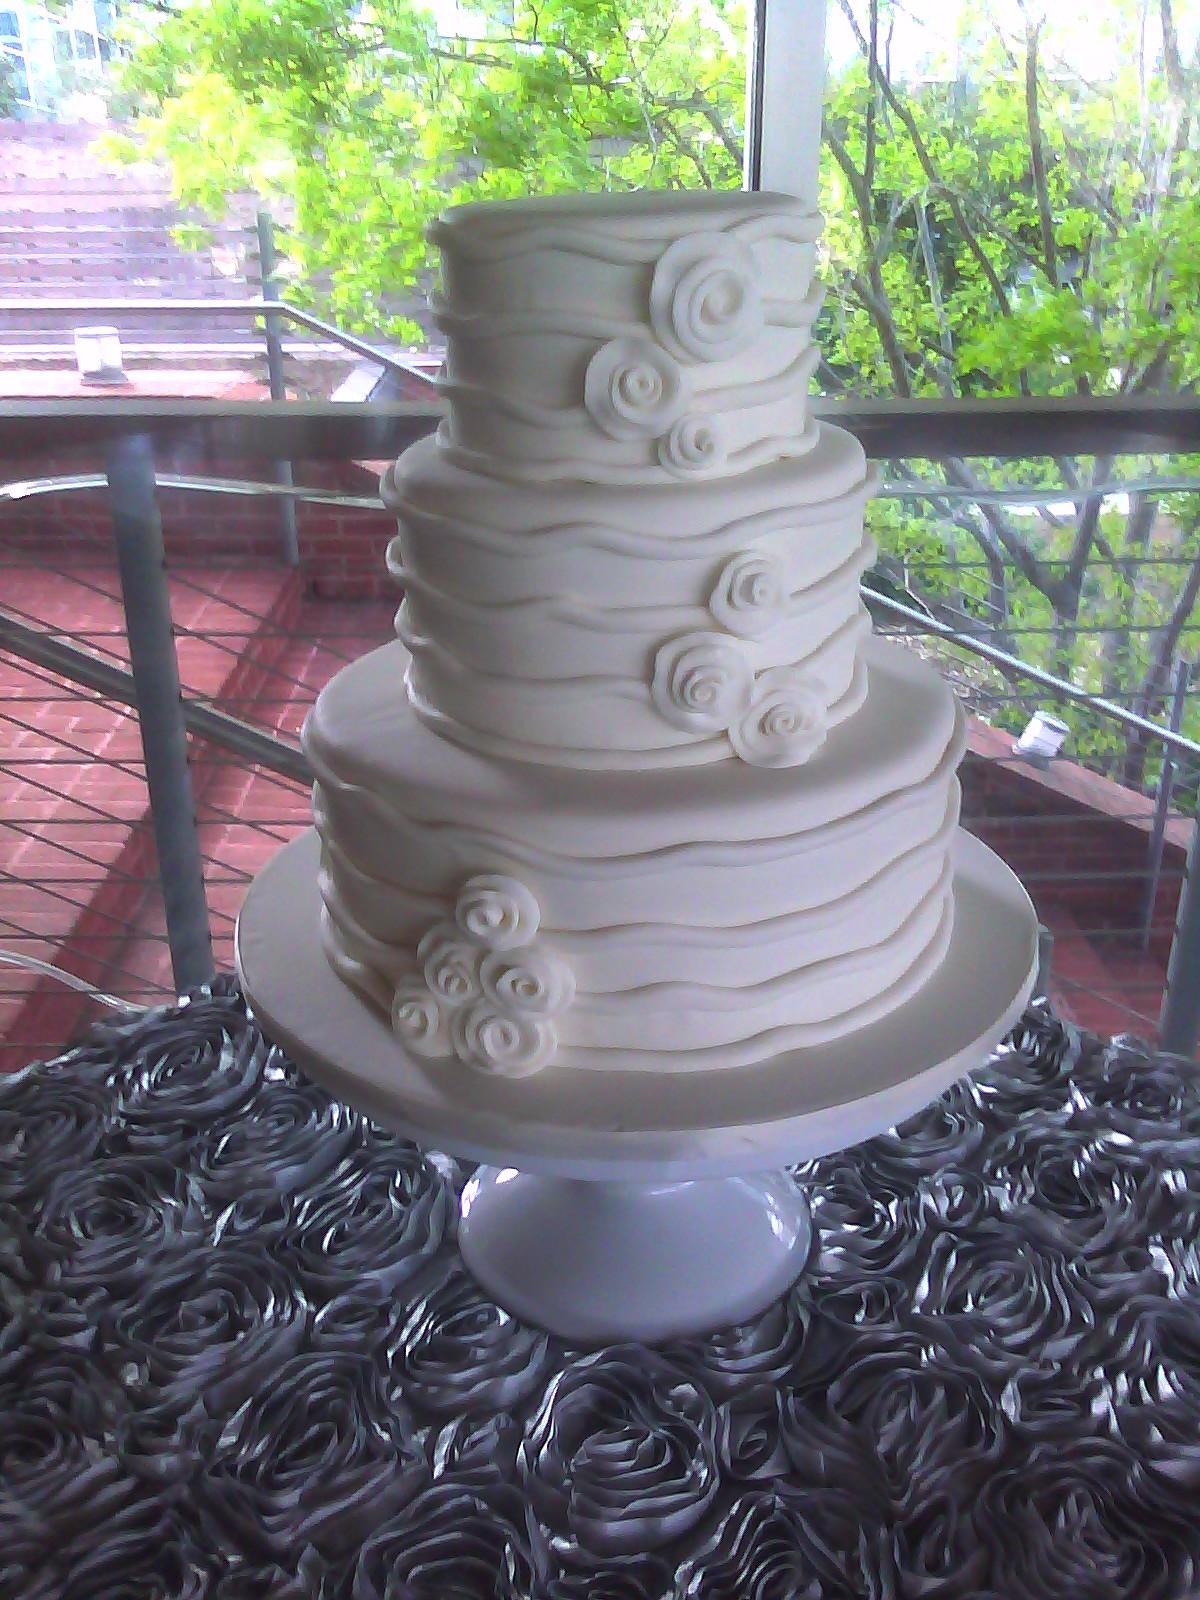 Tags: custom cake, Fondant,